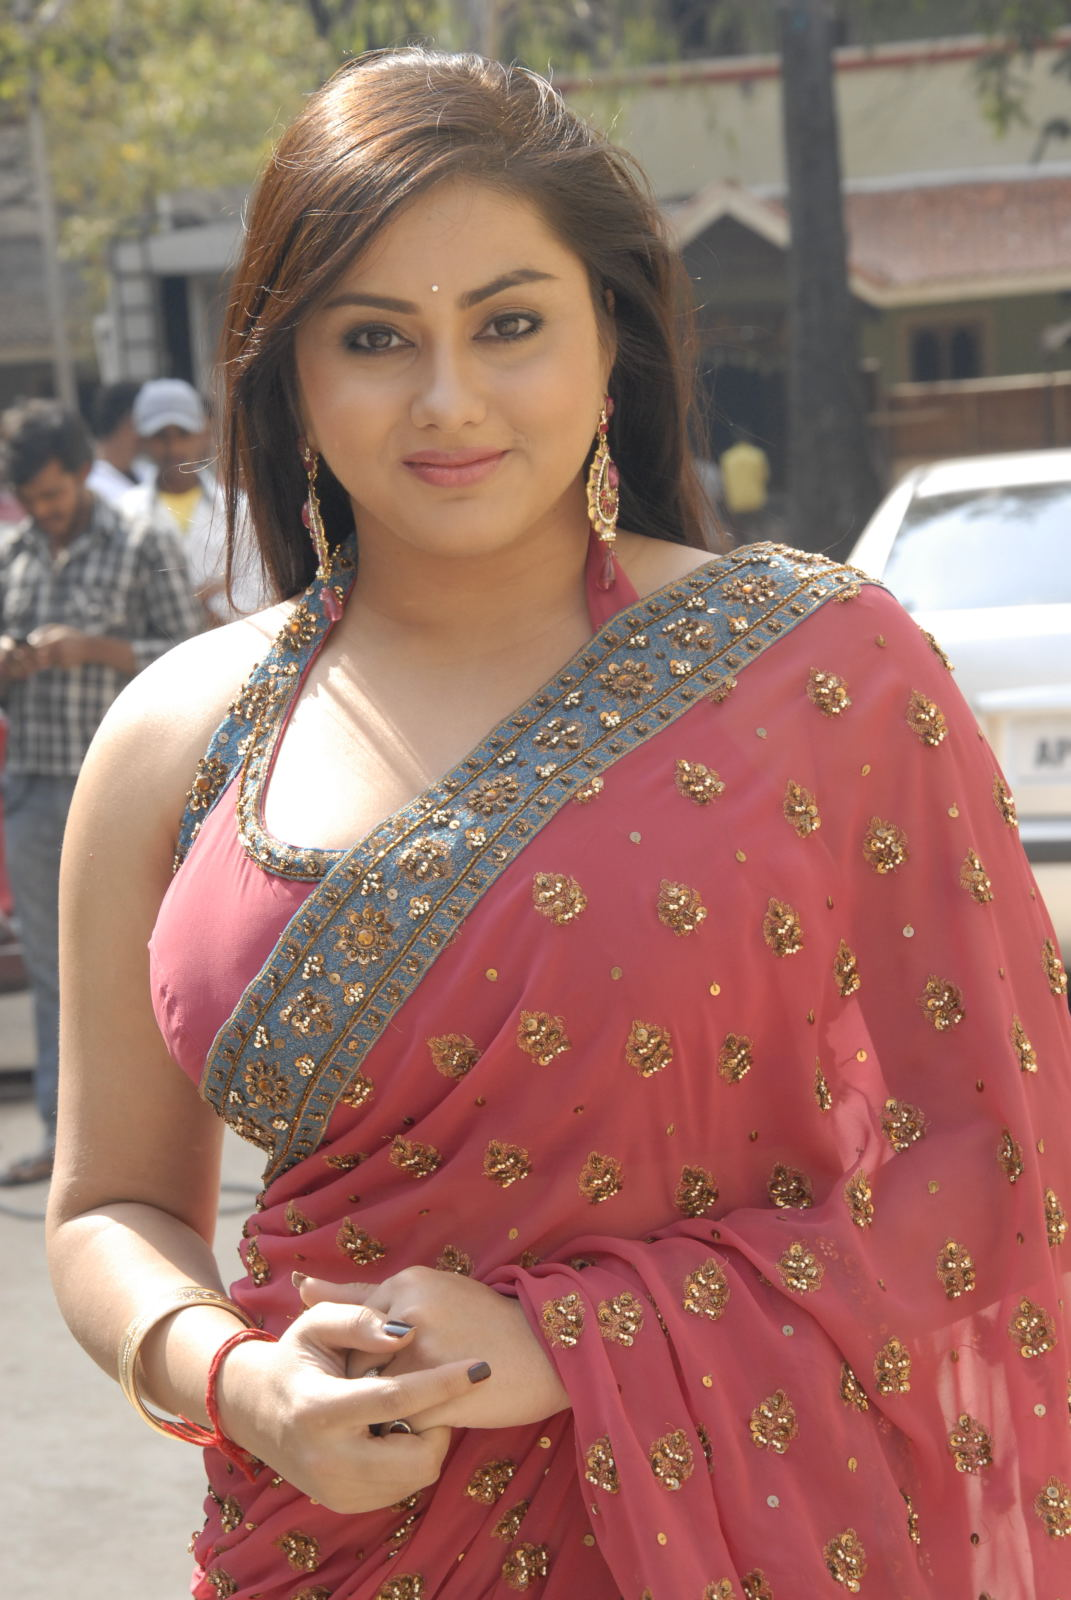 Indian star namitha kapoor sex type - 1 part 7